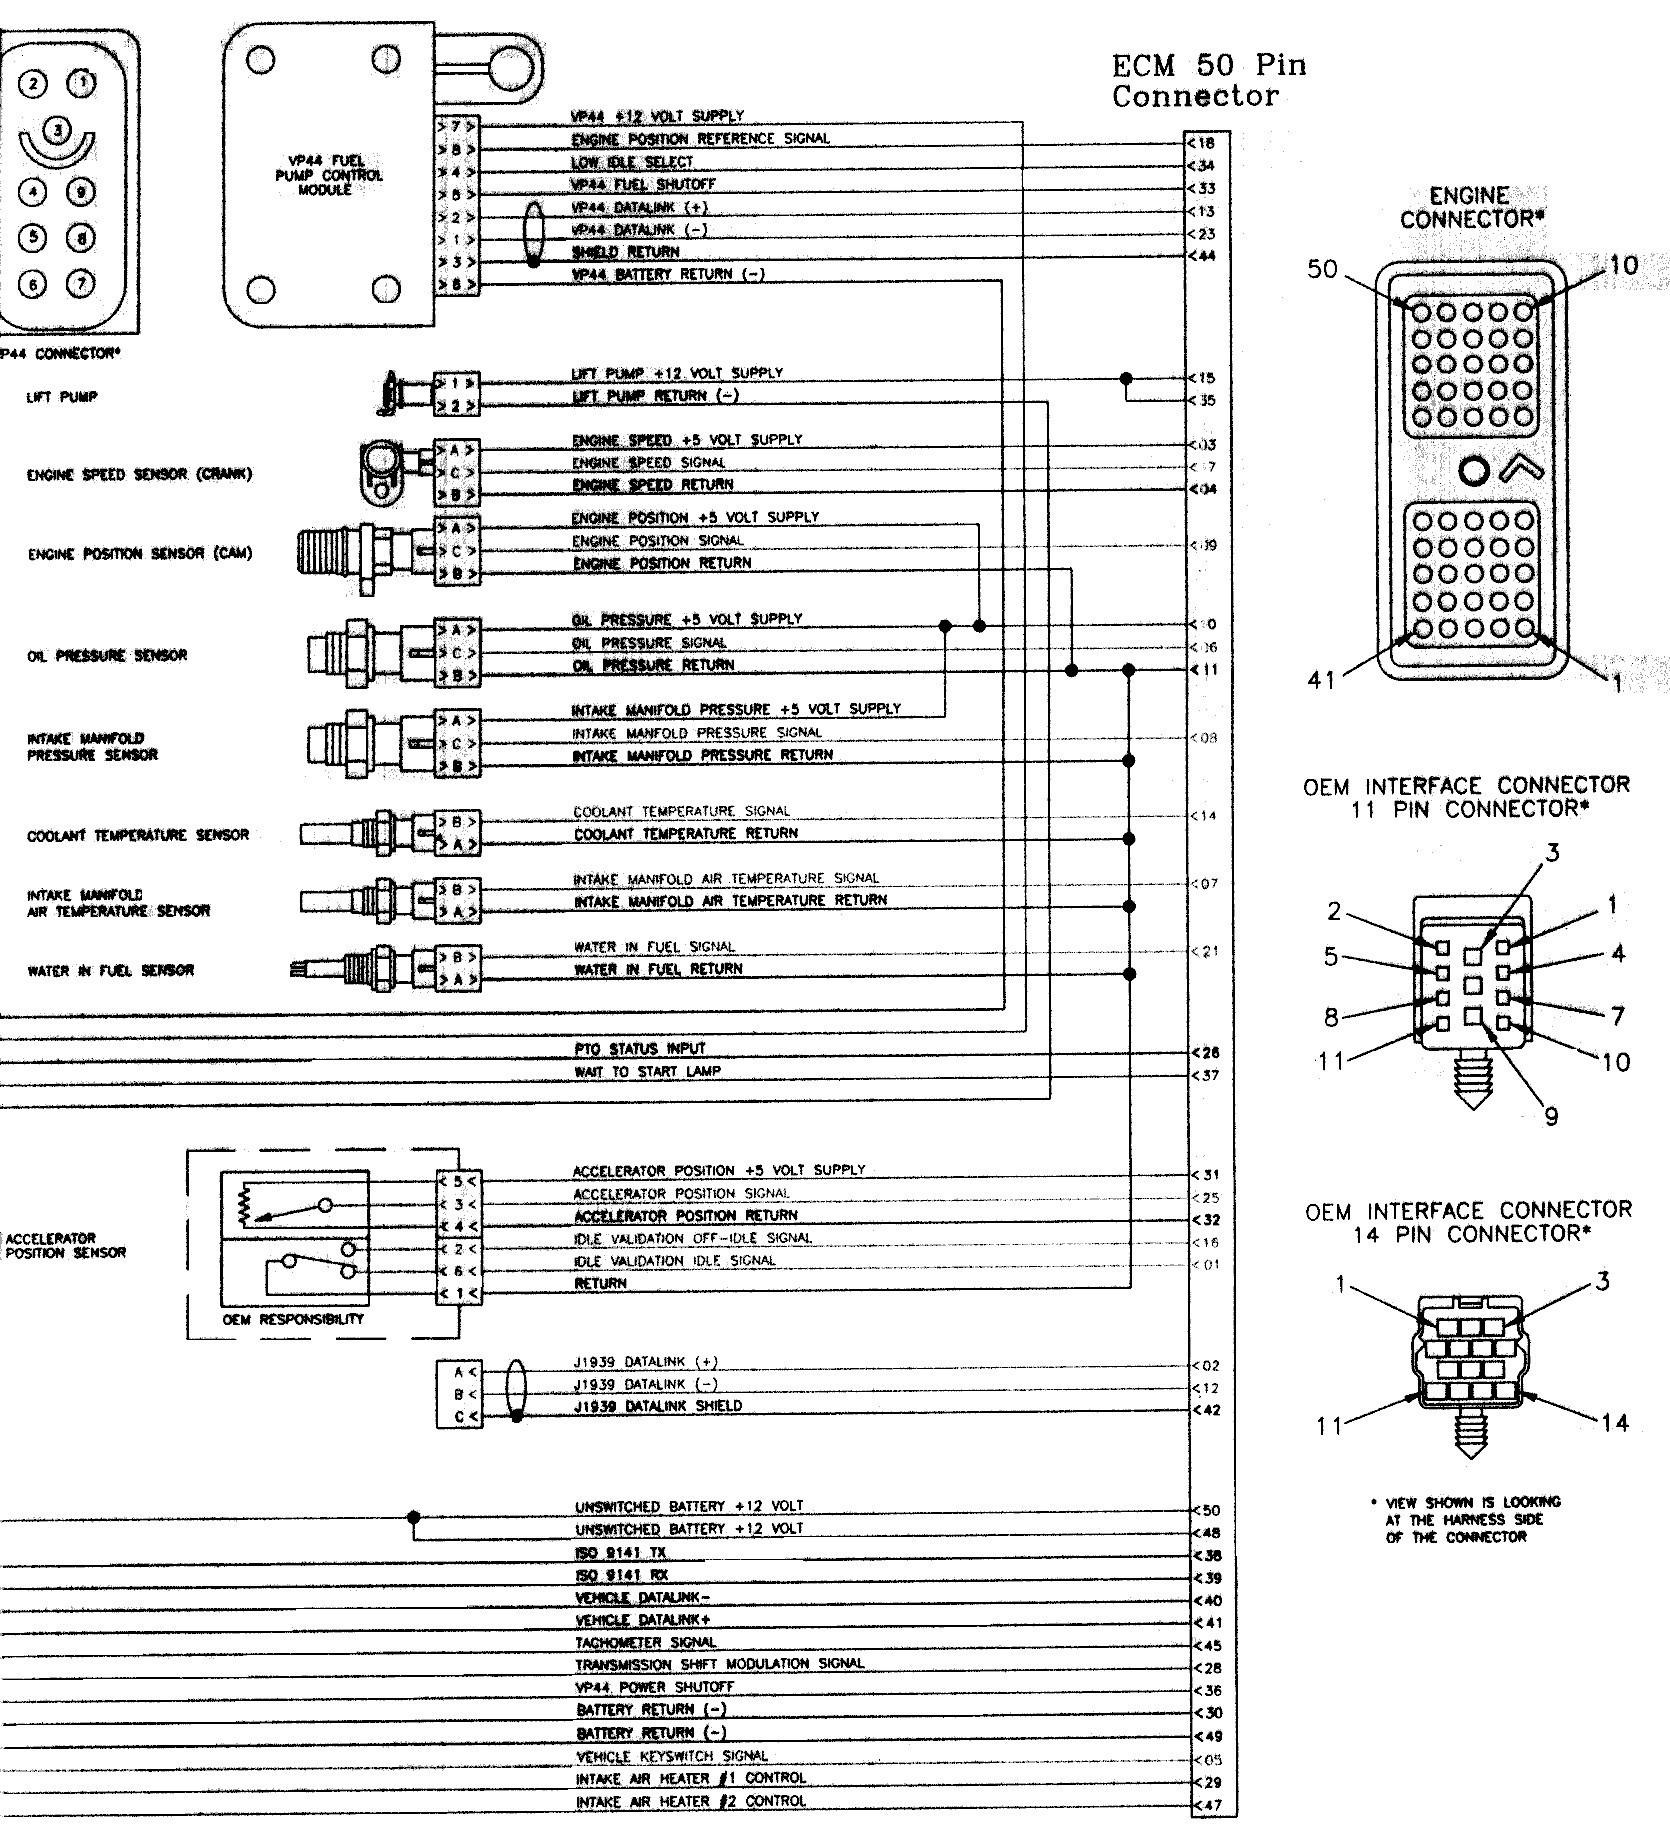 Wiring Diagram 99 Dodge Ram 1500 New 99 Dodge Ram 1500 Radio Wiring Diagram New Stereo